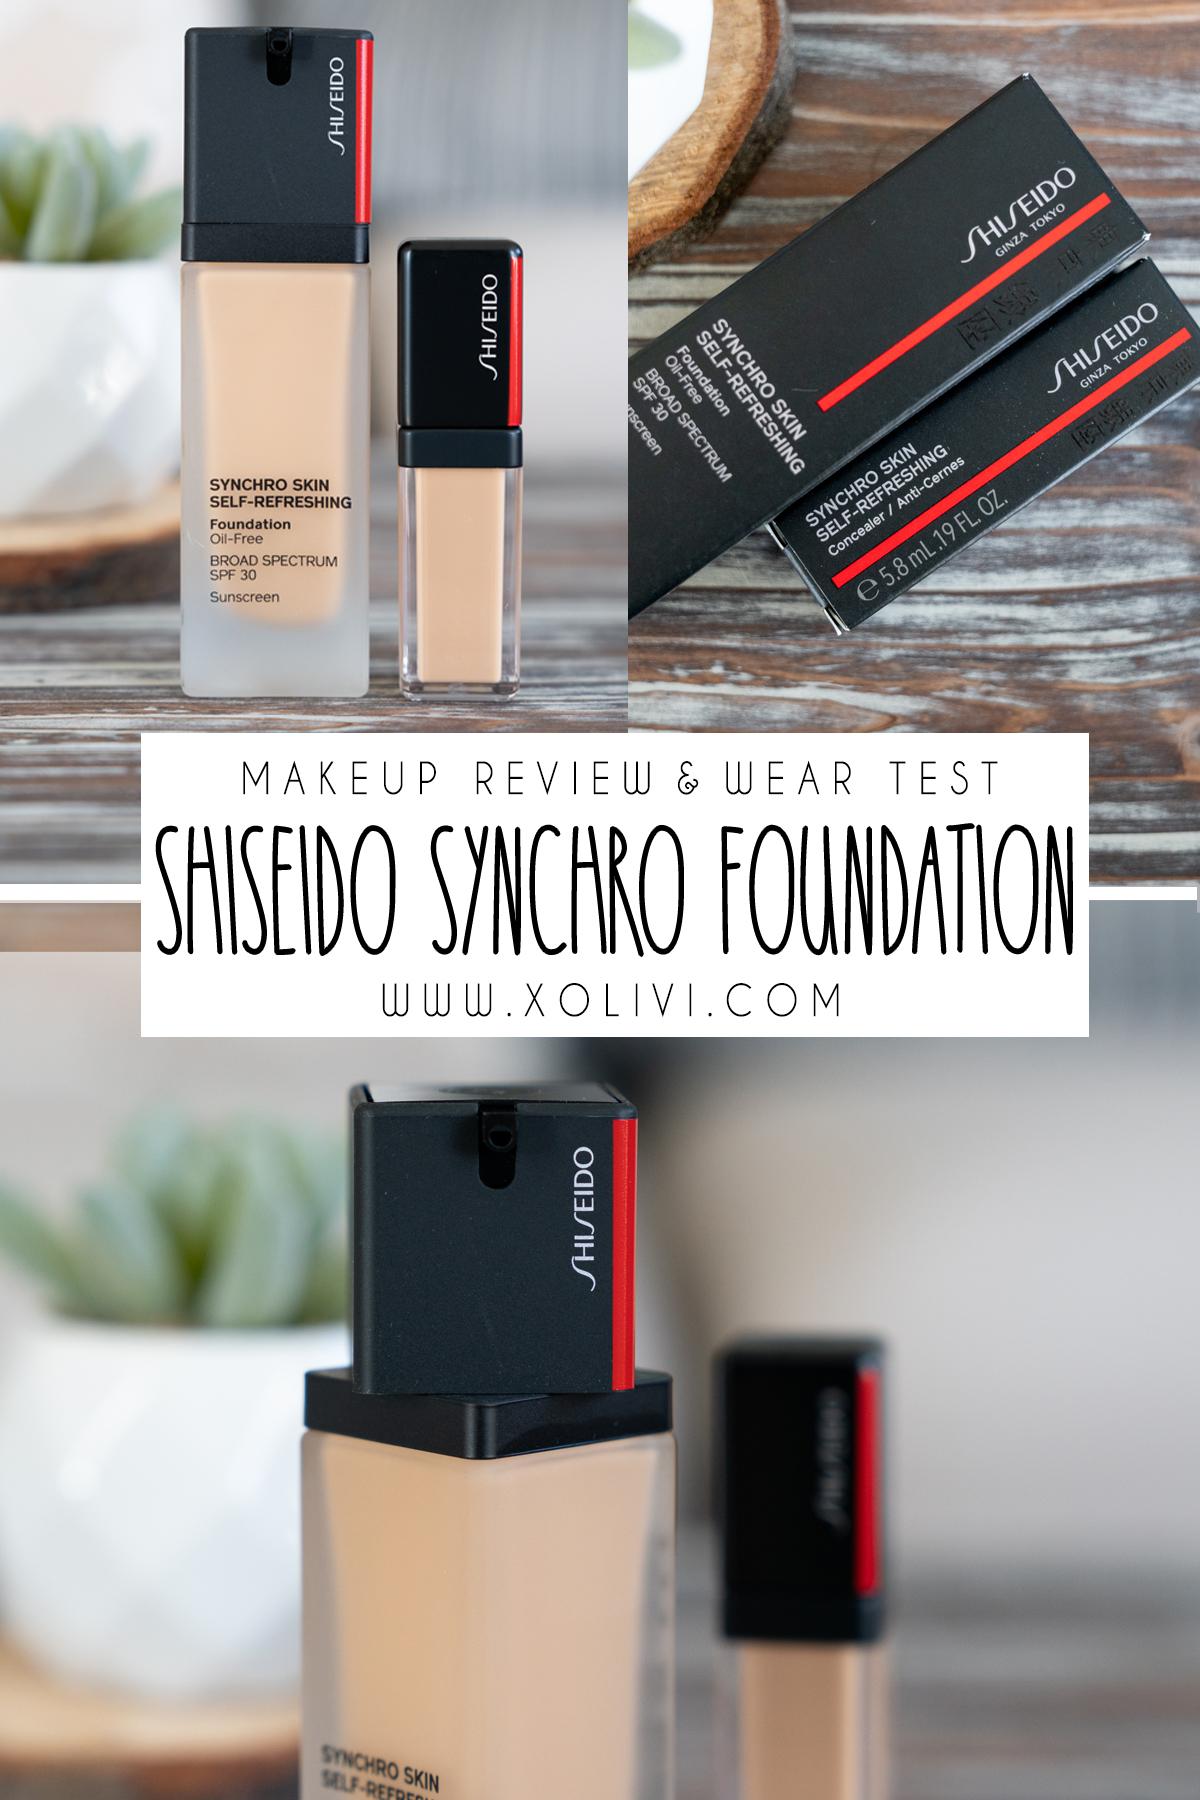 shiseido synchro skin self-refreshing foundation and concealer